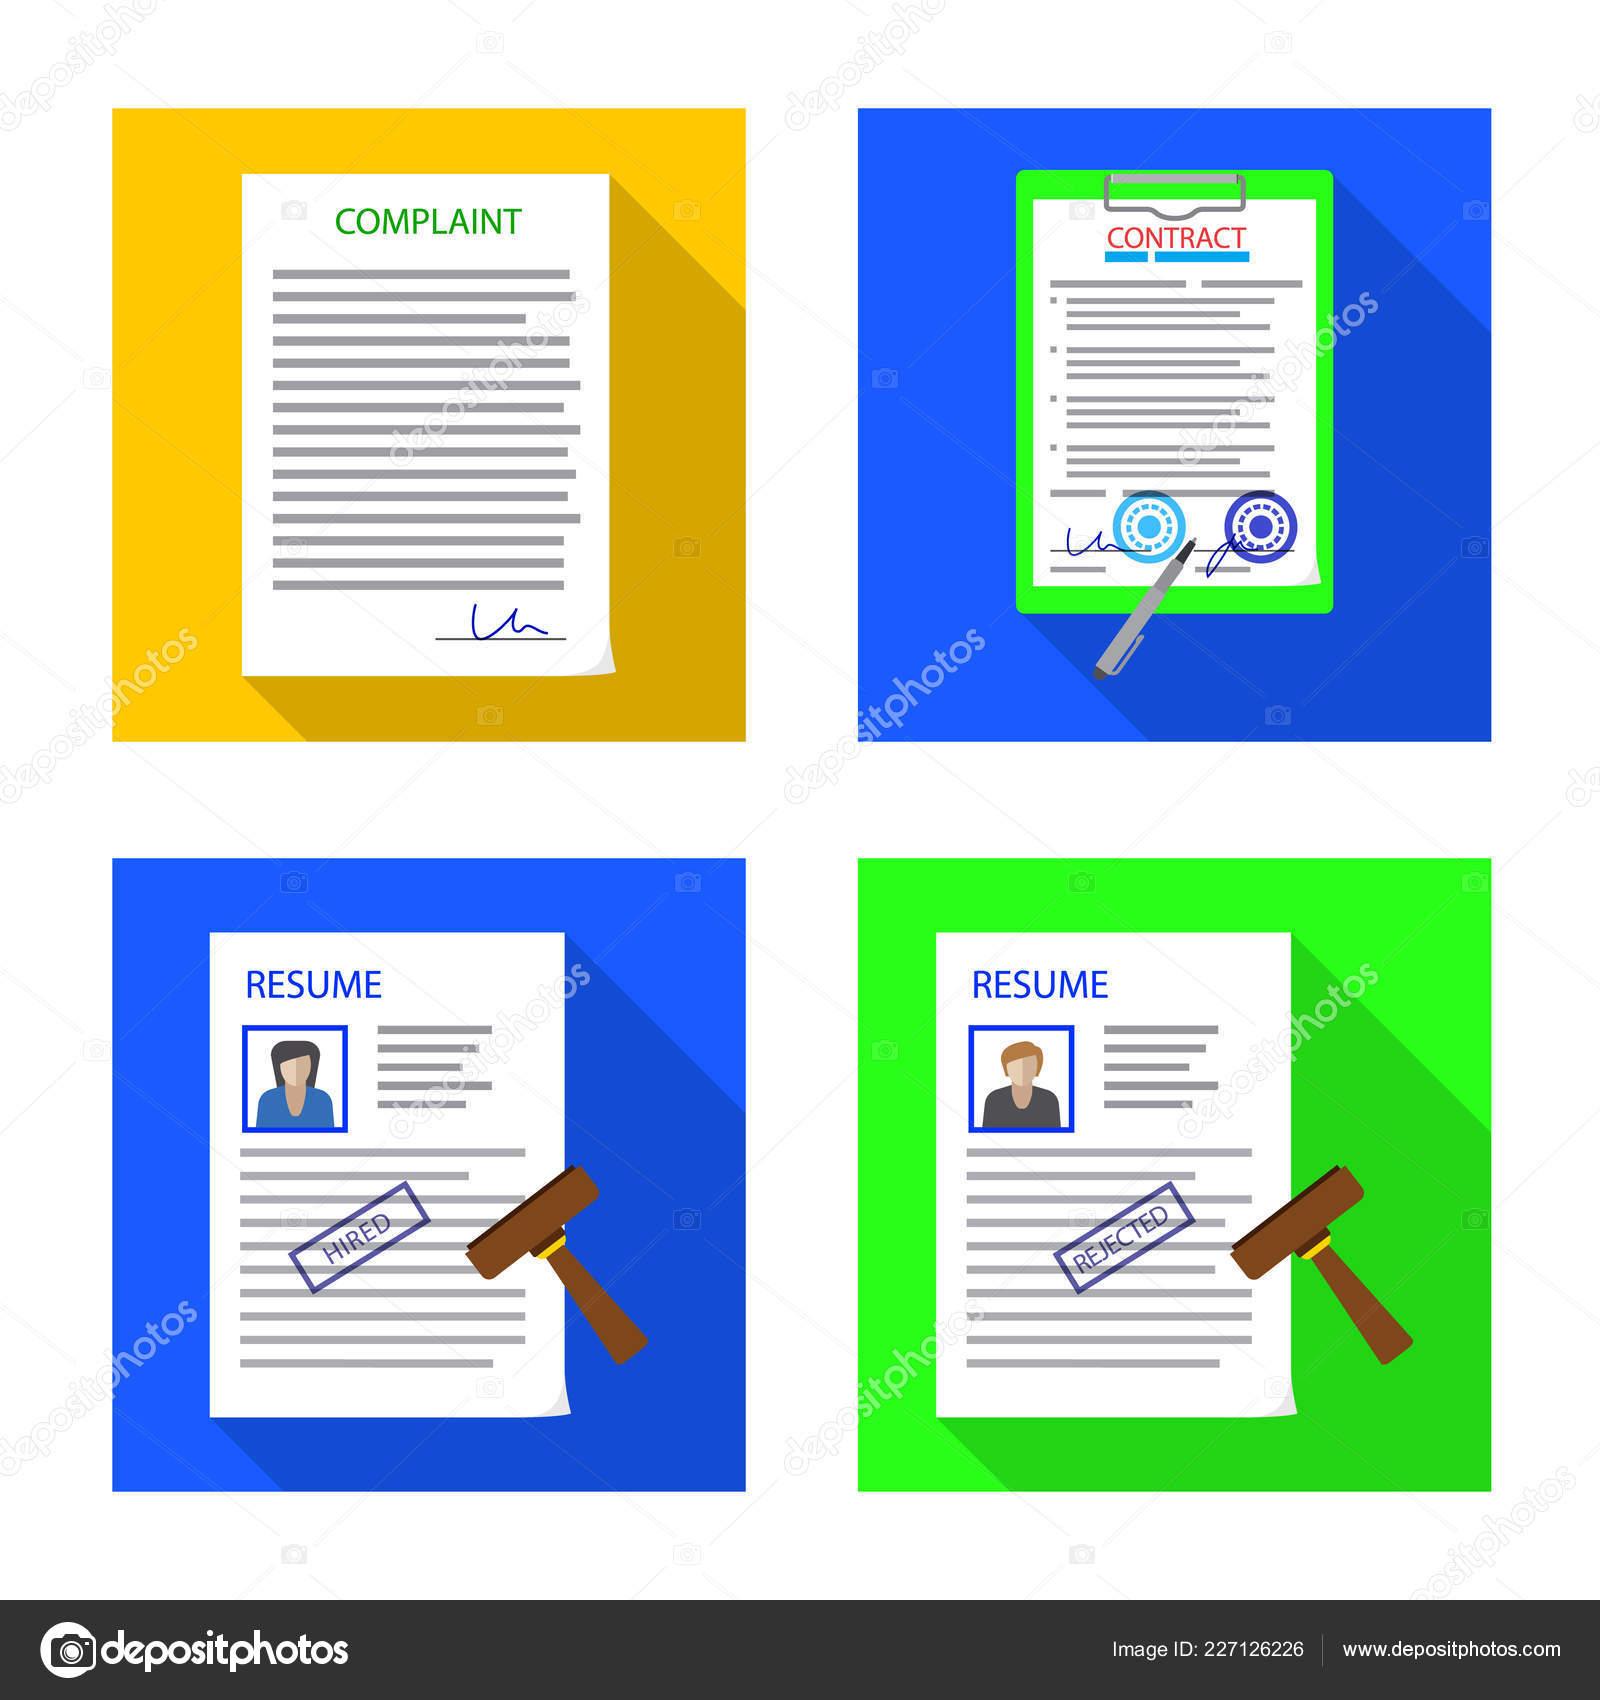 Isolated Object Form Document Icon Set Form Mark Stock Symbol